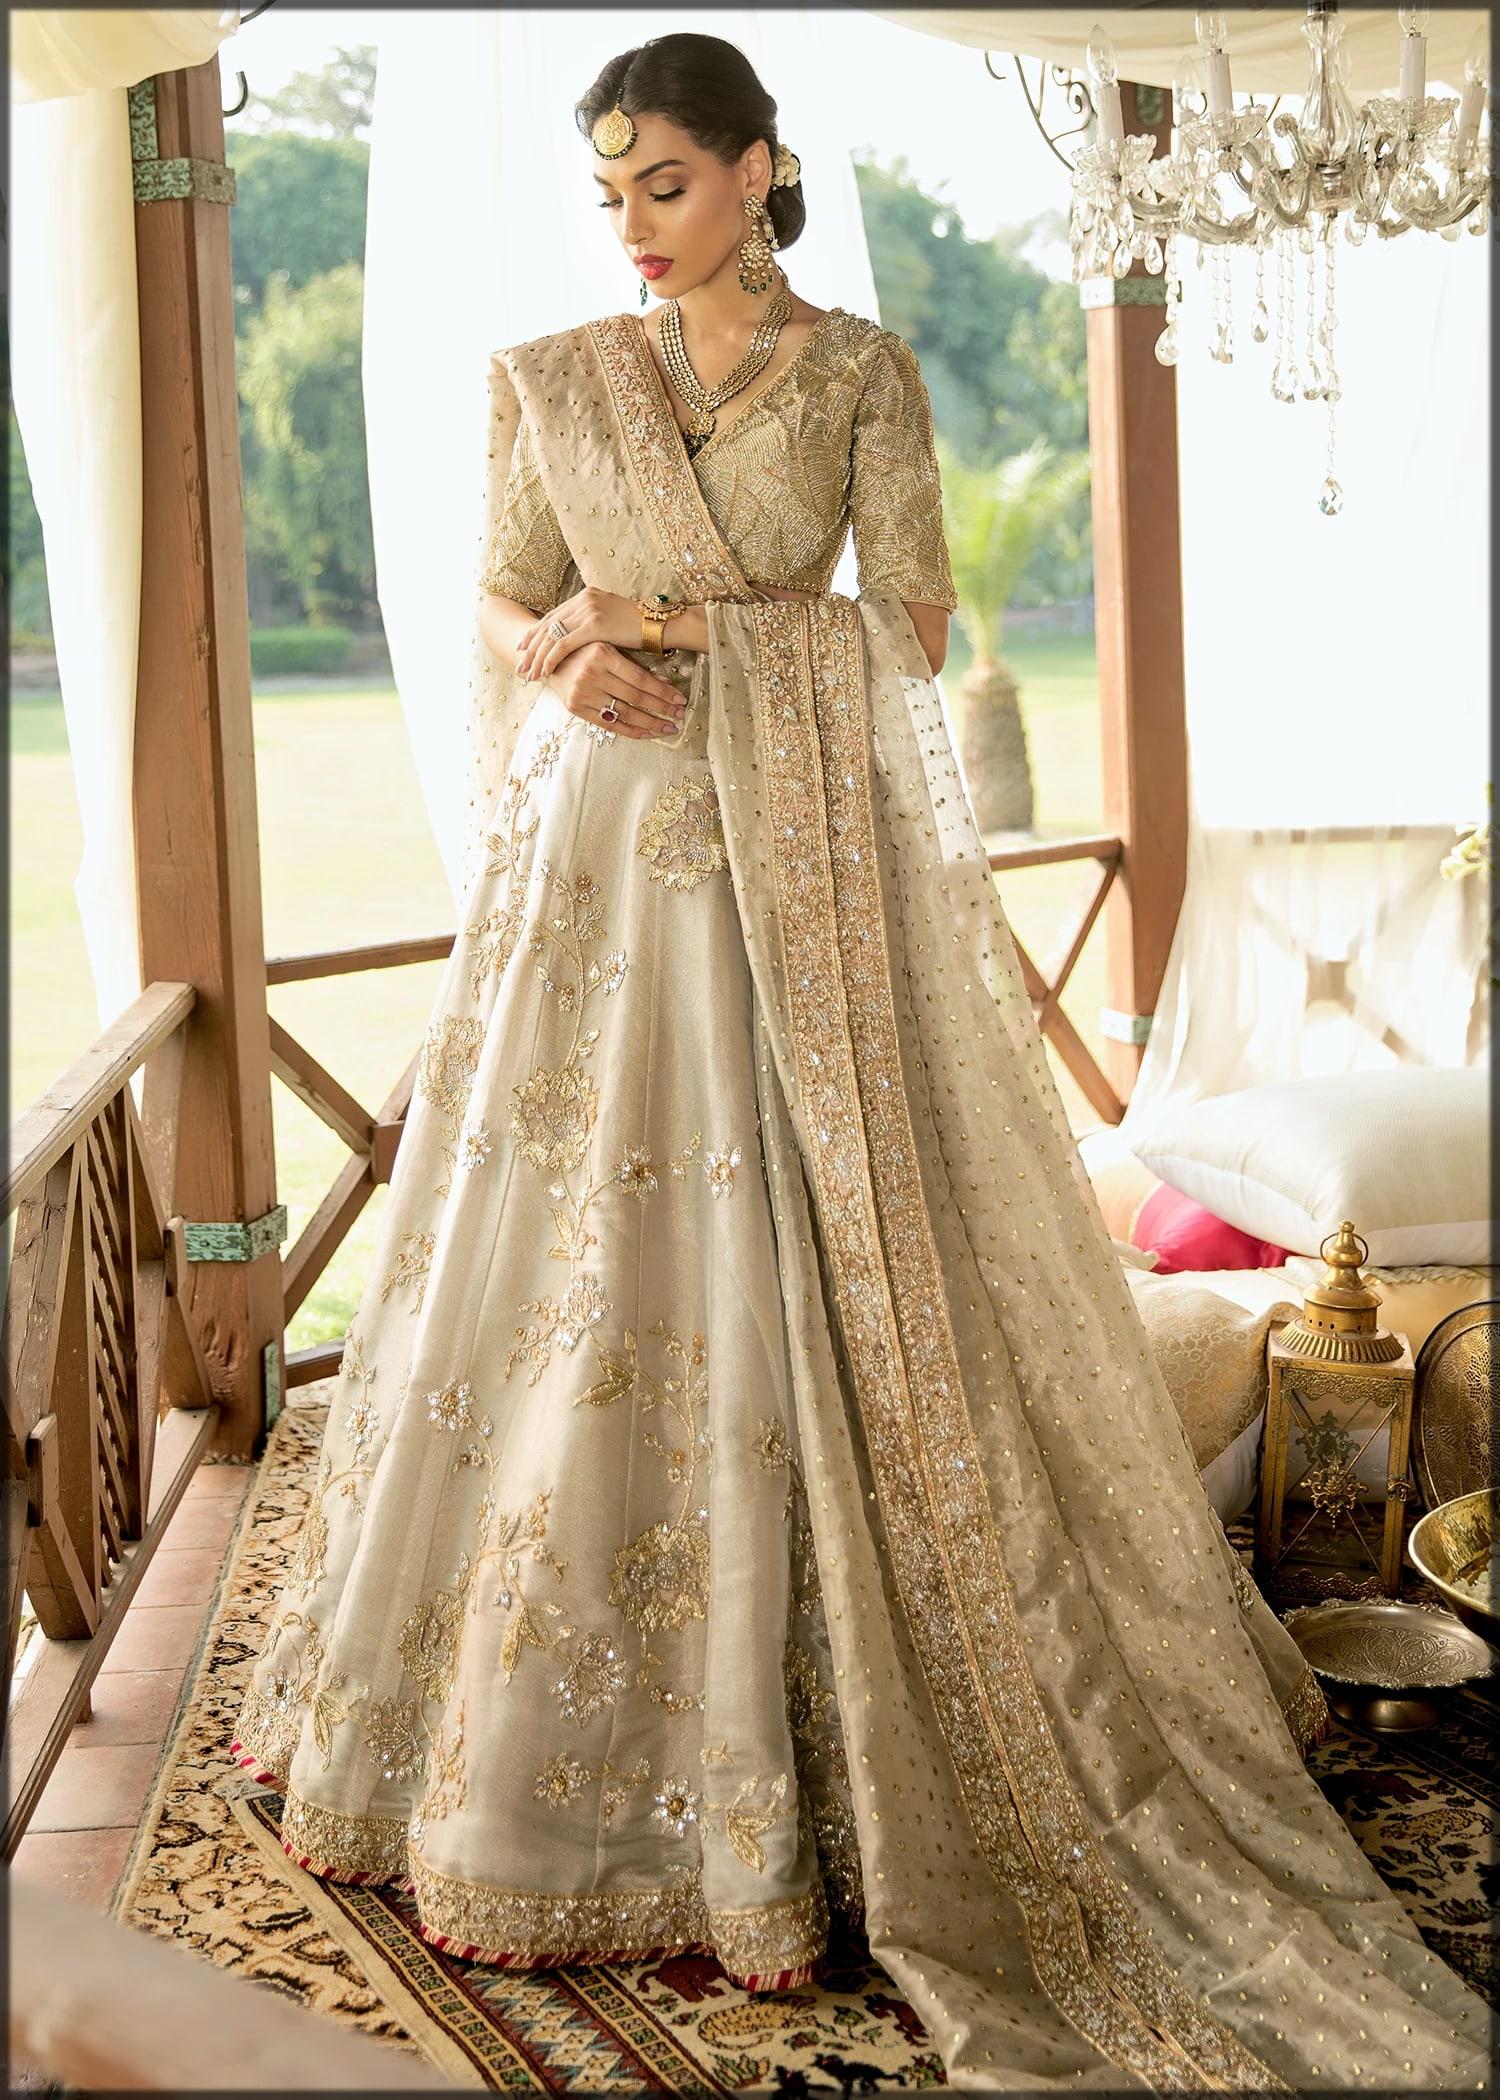 new golden bridal dress for barat